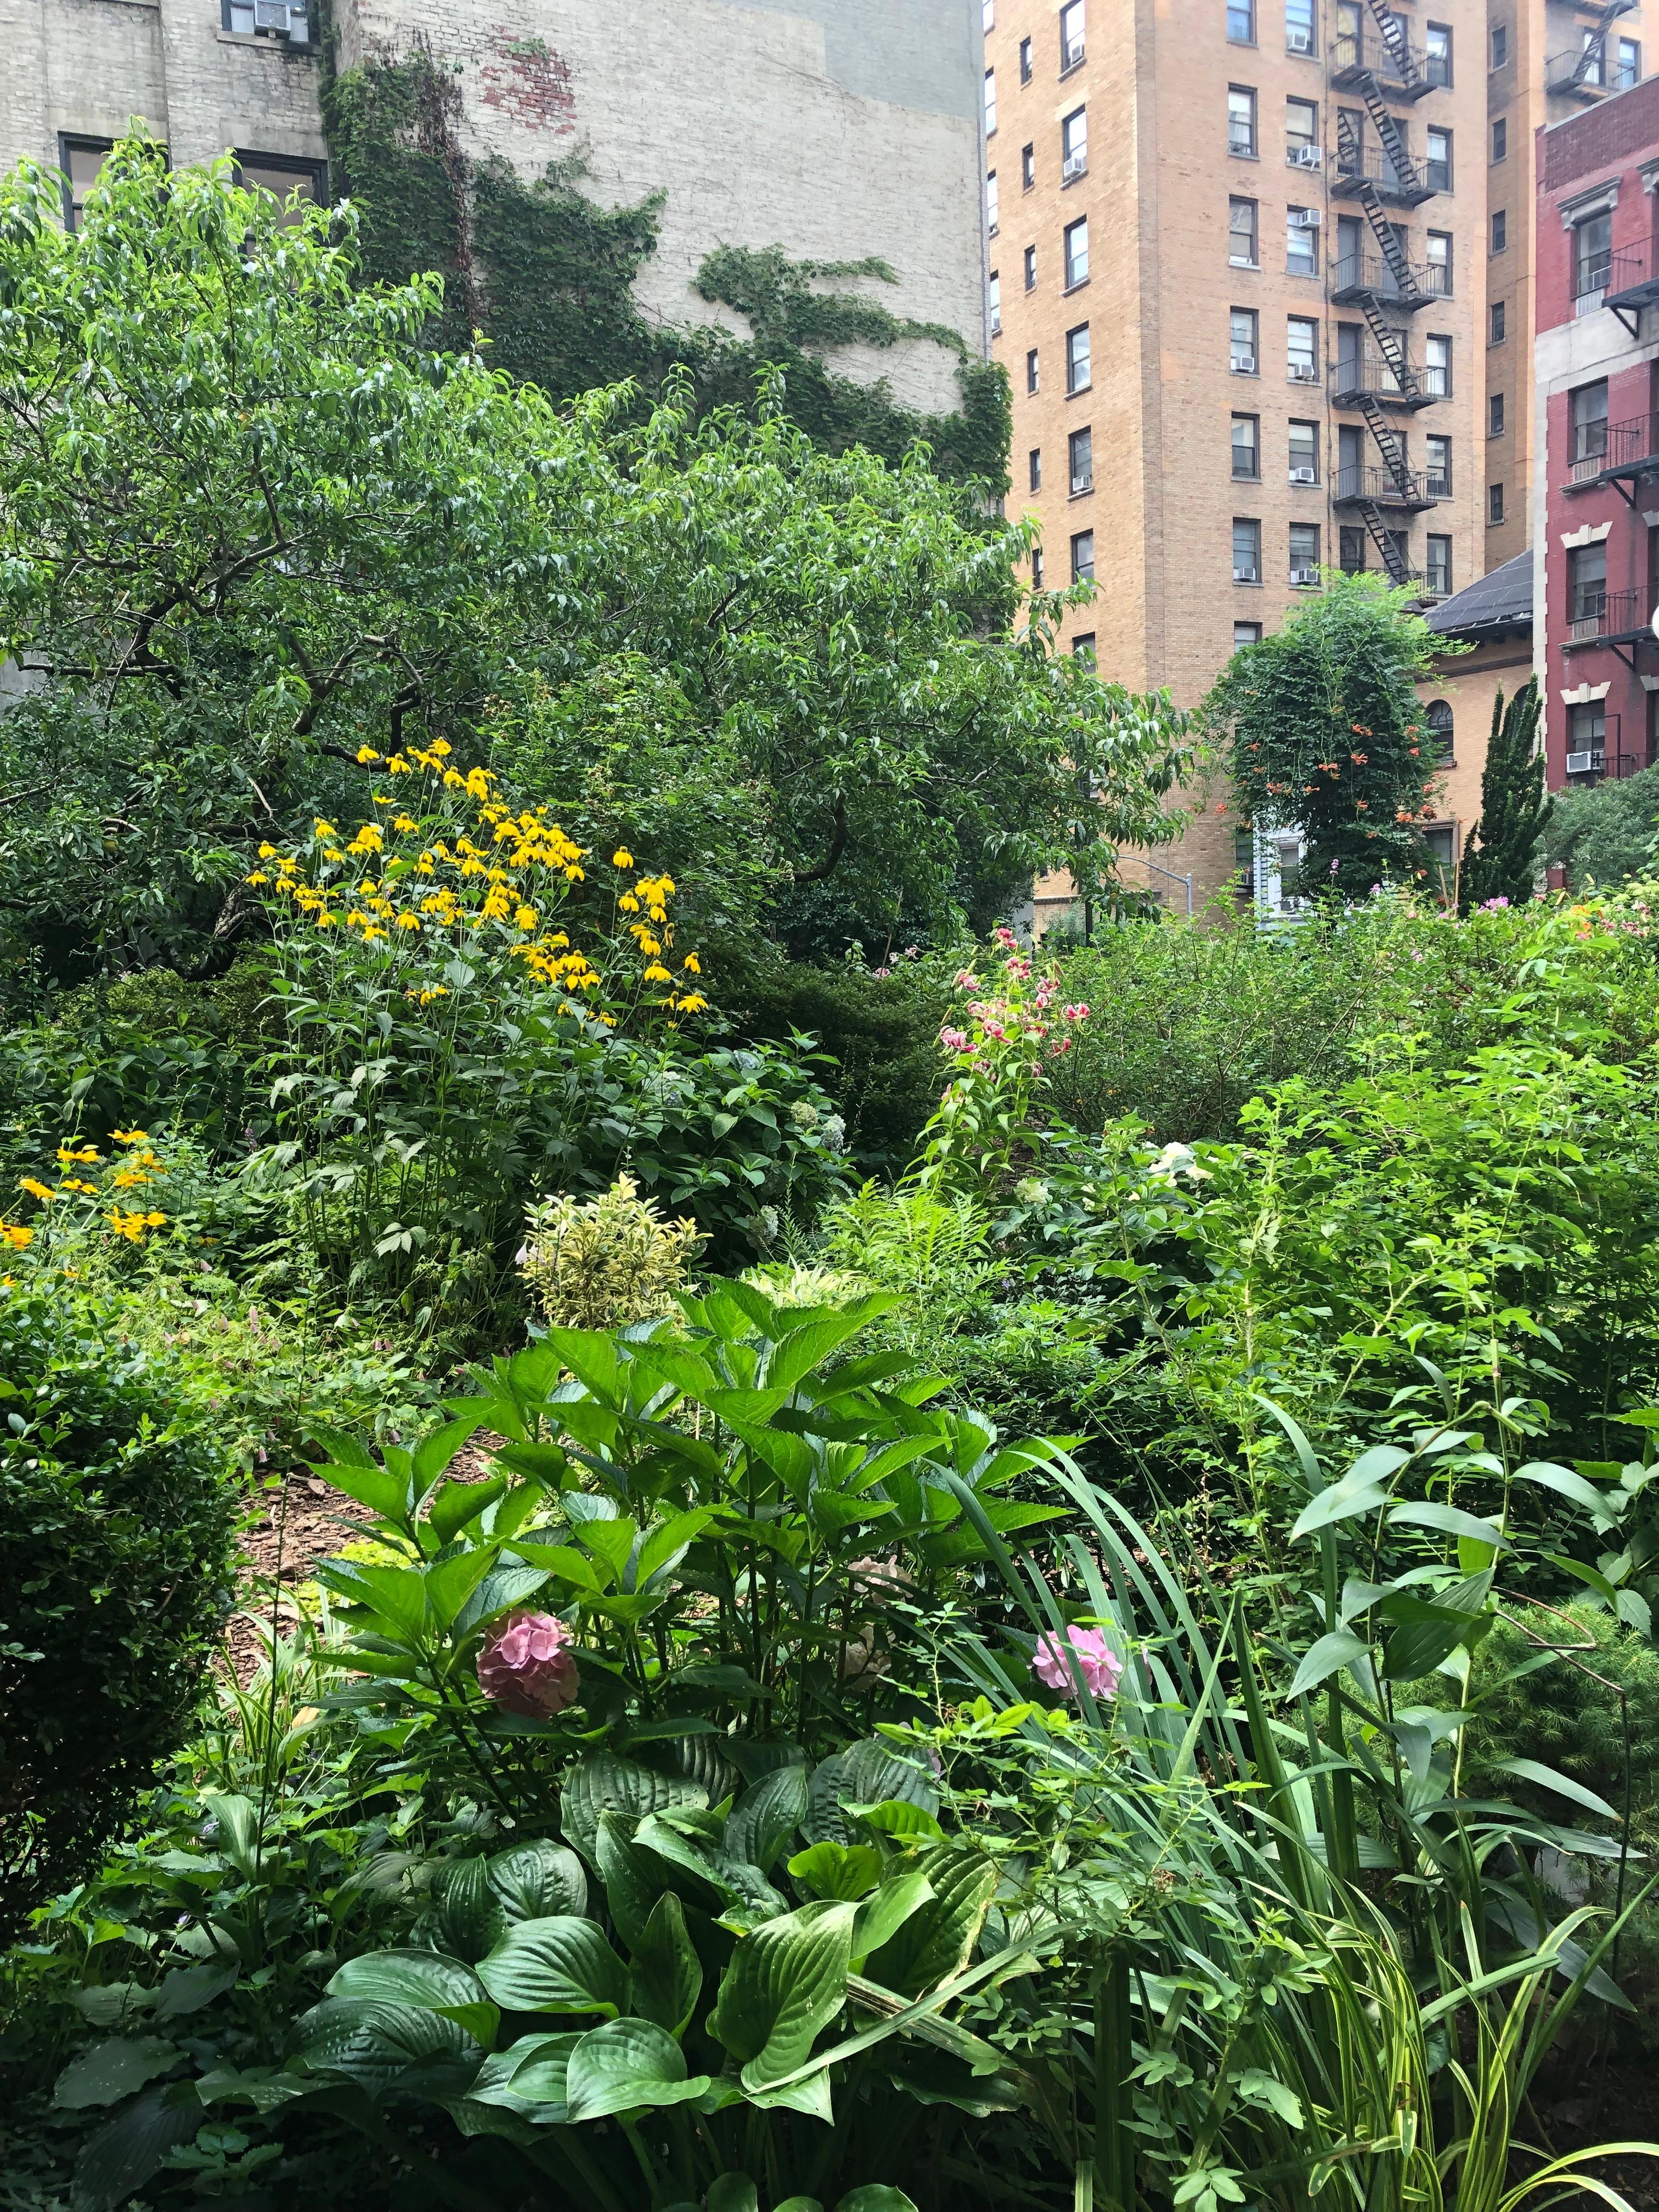 072619-.Lotus-Garden